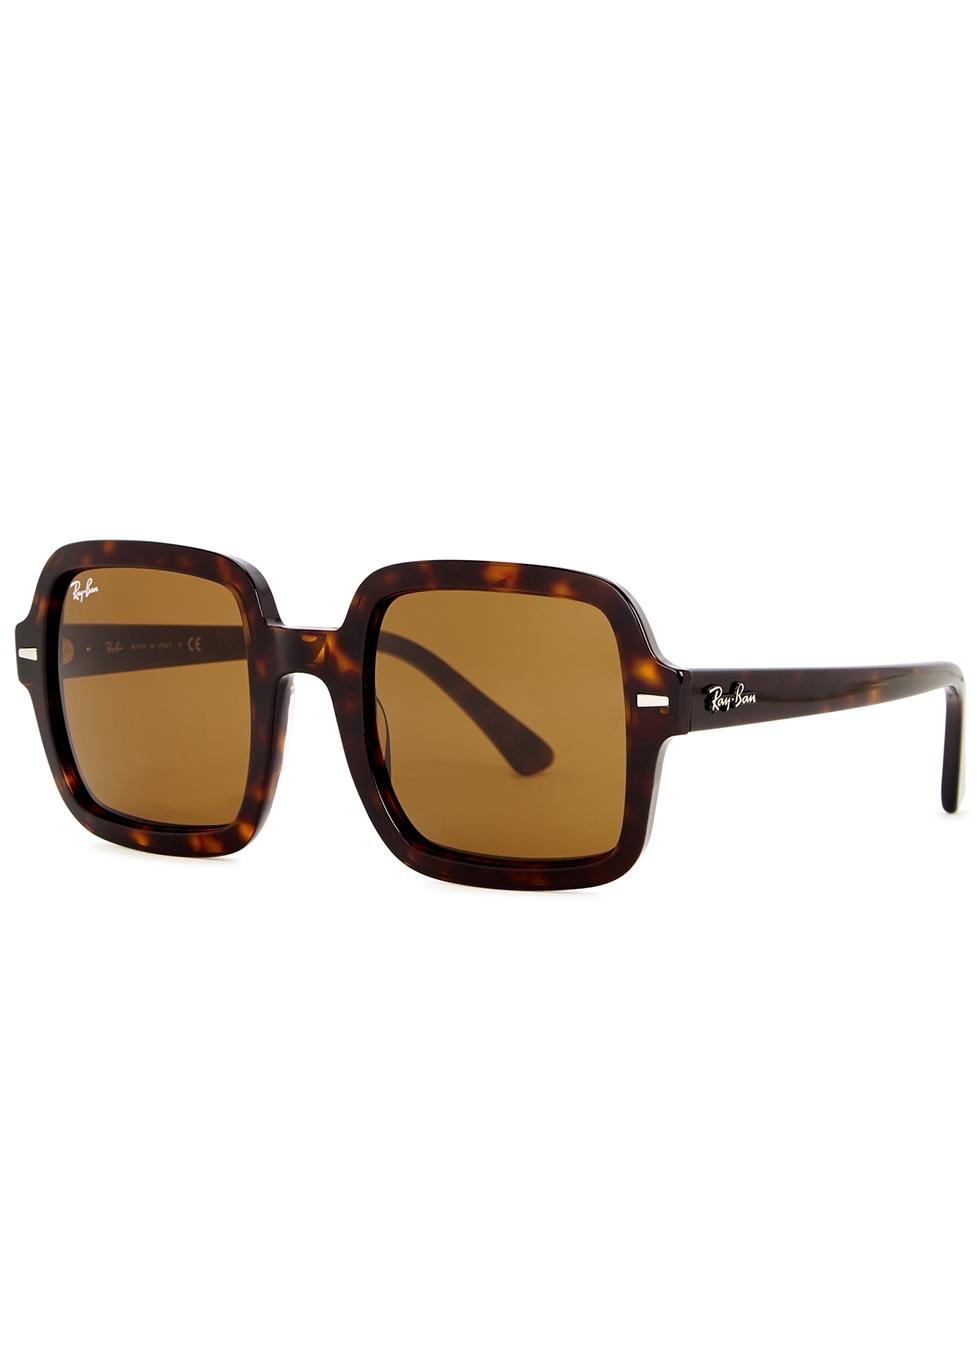 ray ban square frame sunglasses